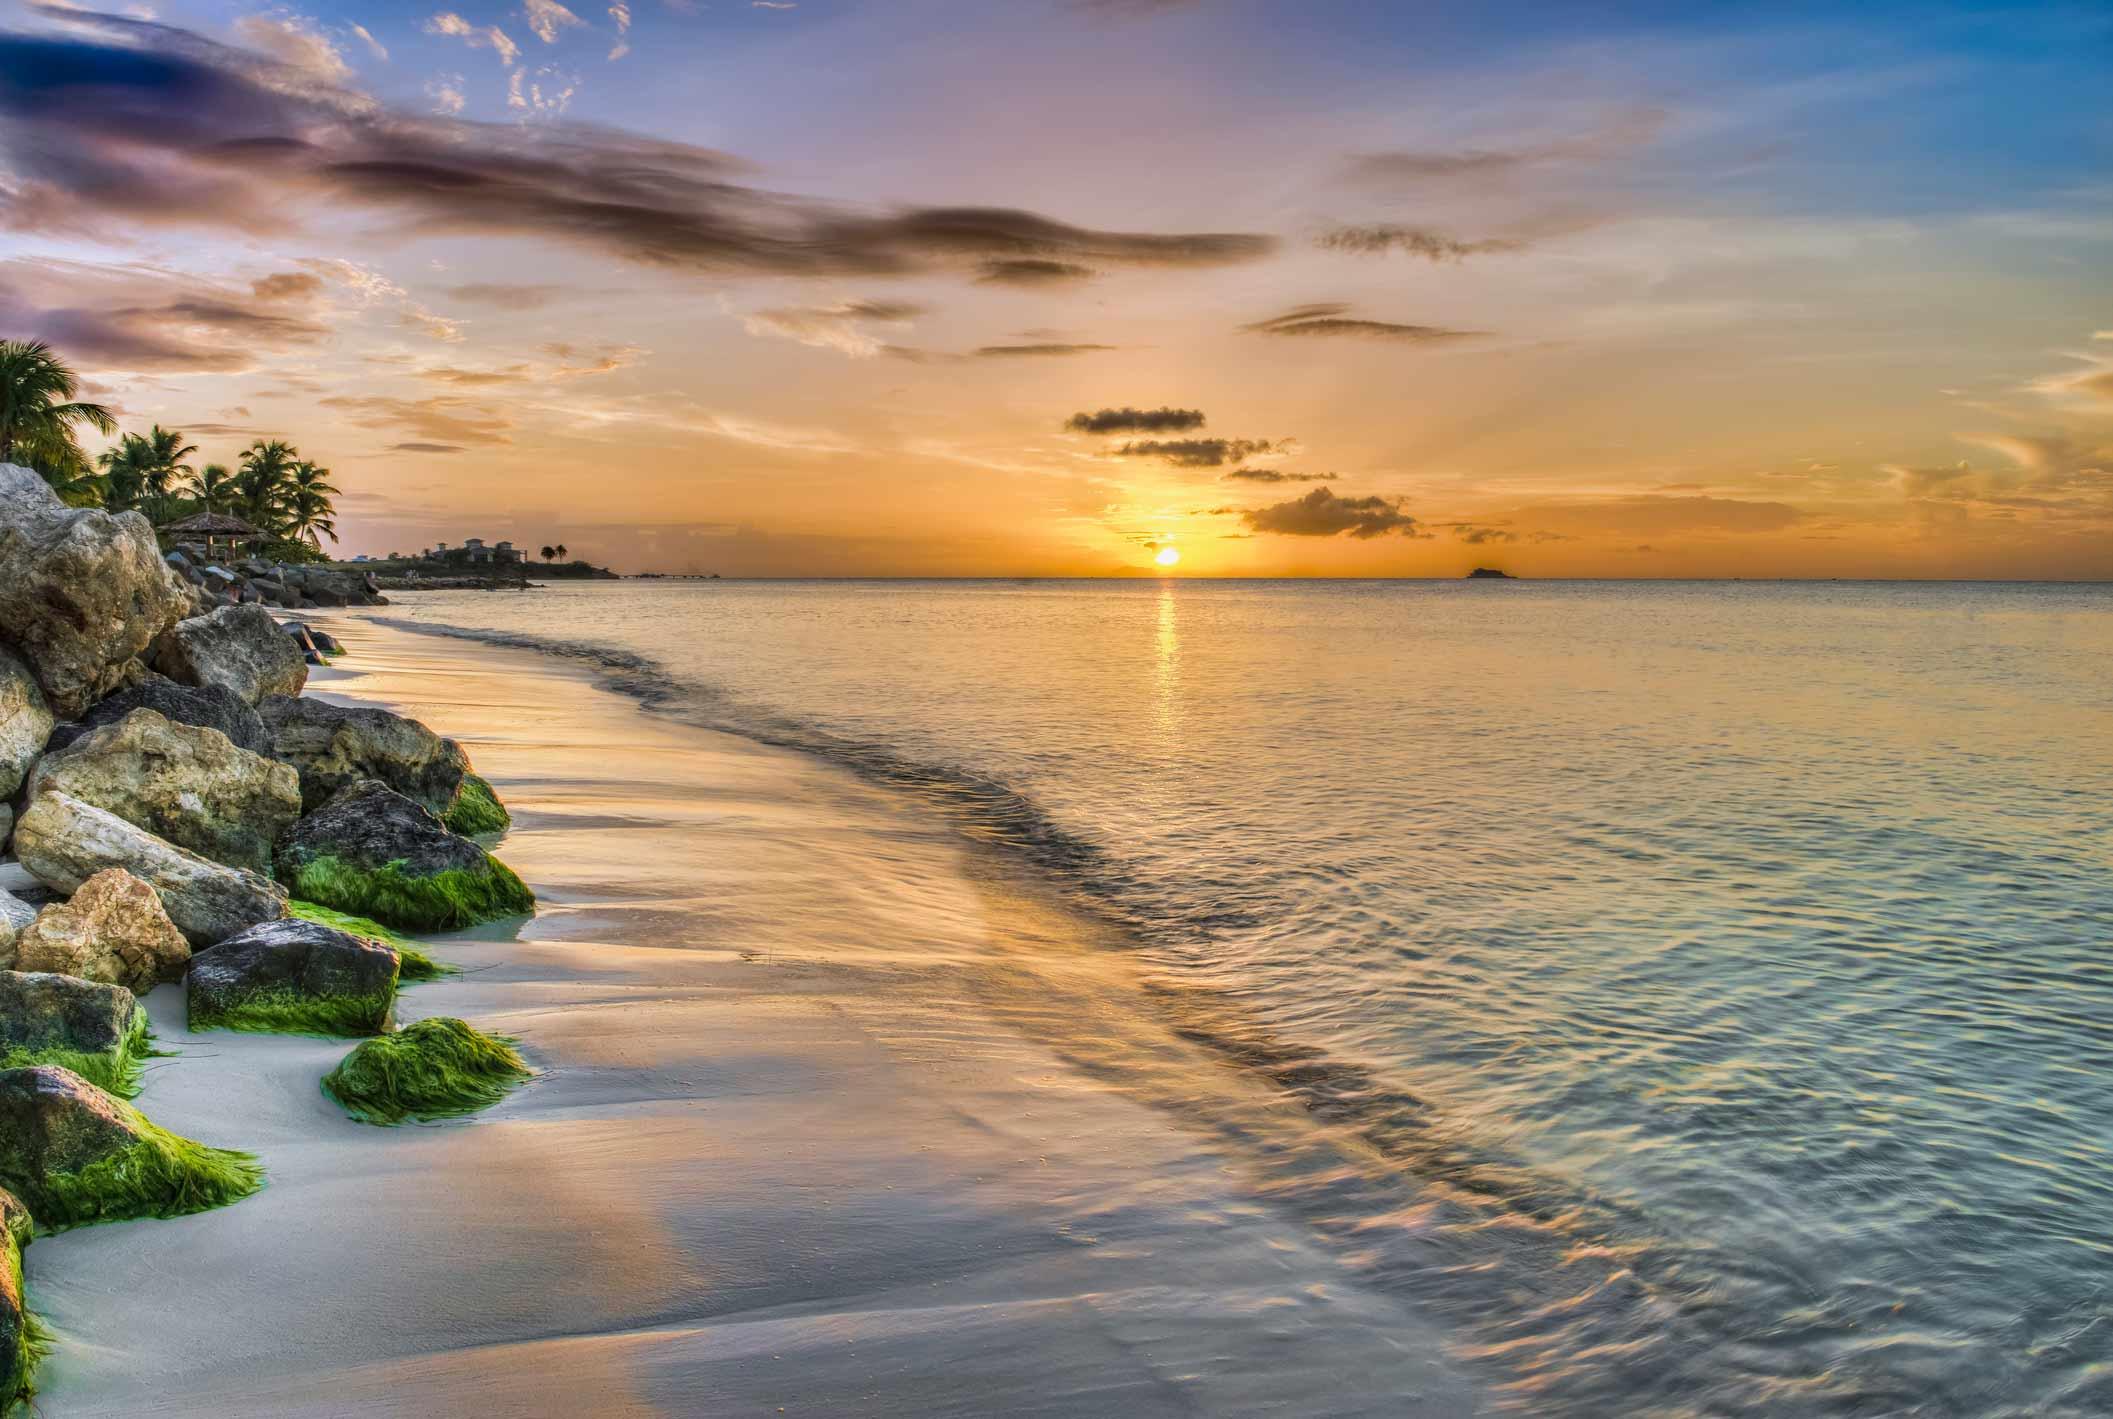 RHMB_Antigua_coast01.jpg